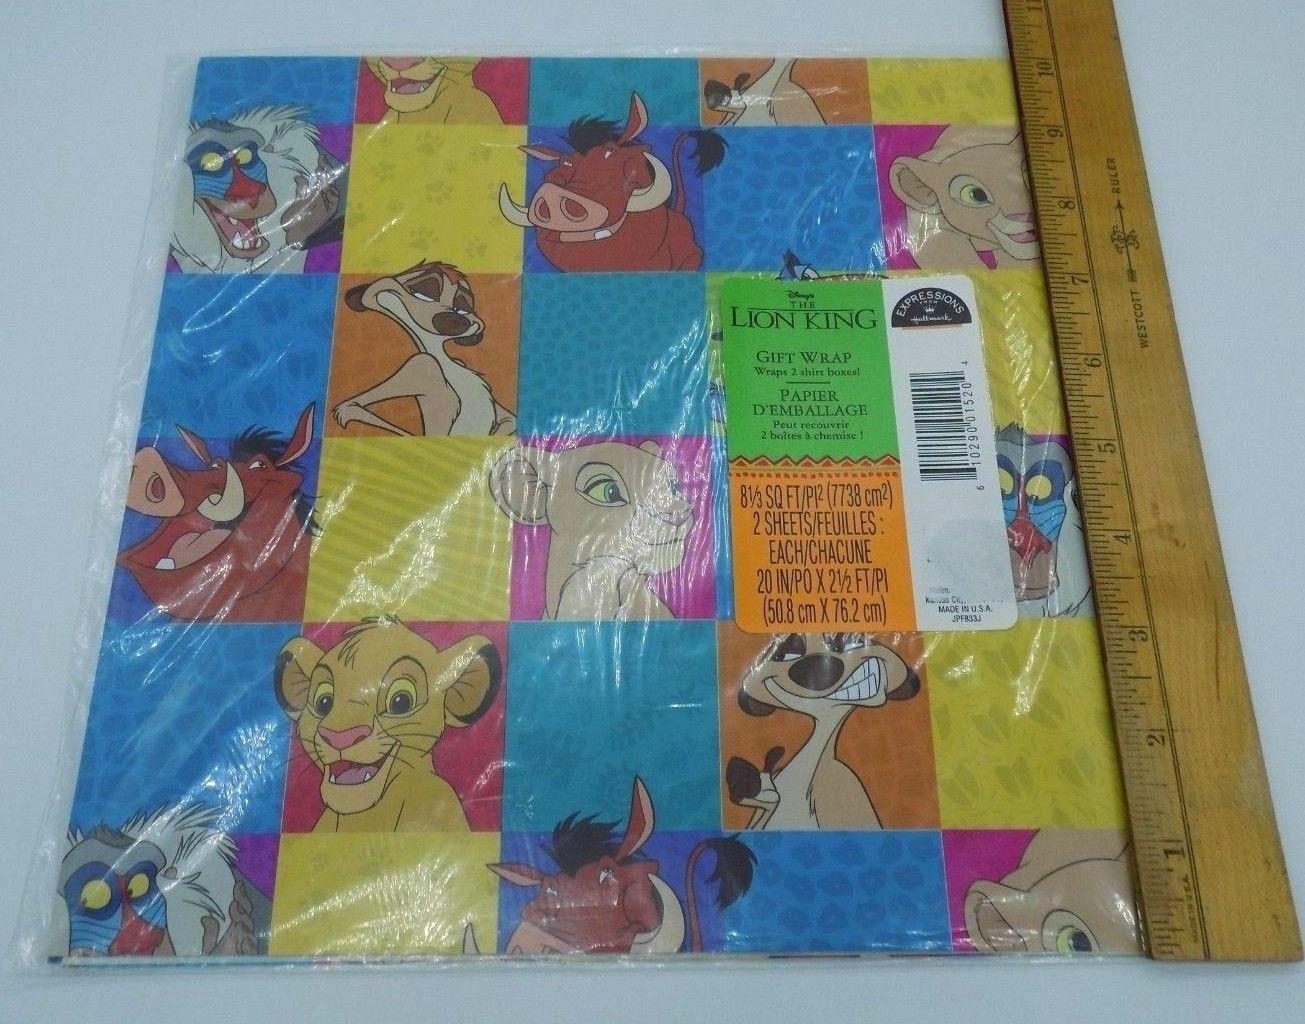 Simba Nala Lion King Wrapping Paper NALA LION KING Personalised Gift Wrap